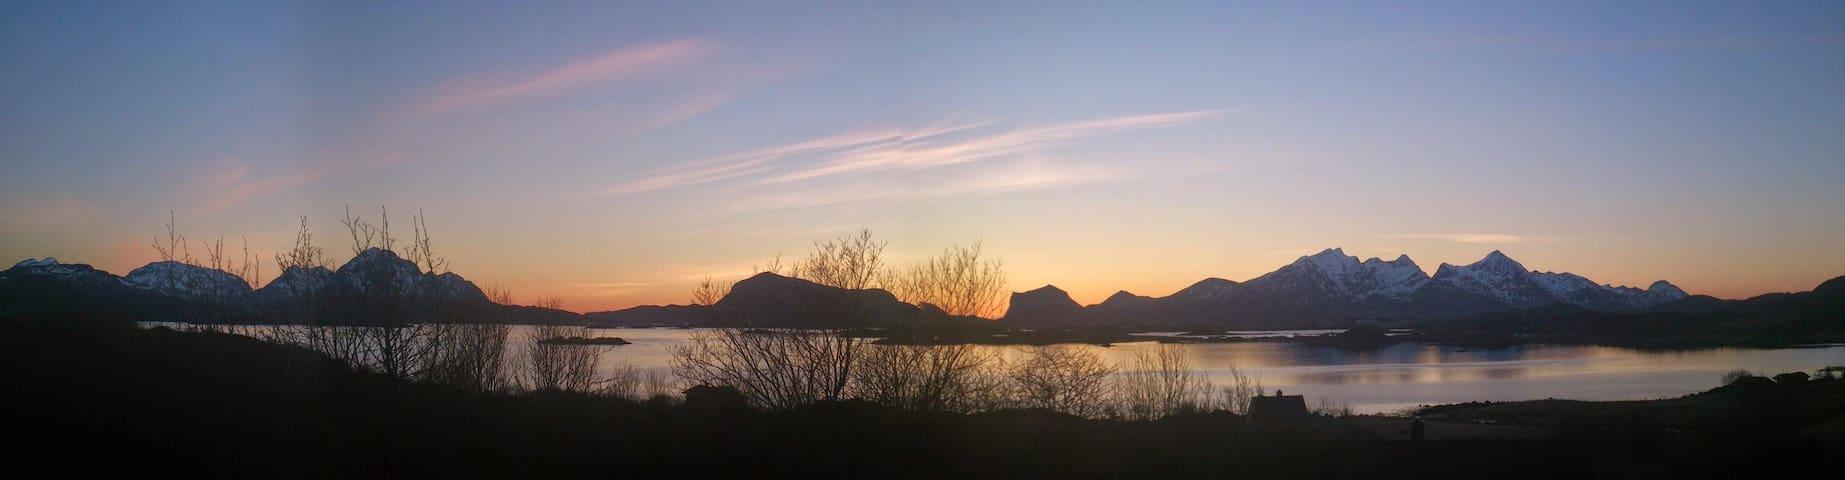 Midt i Lofoten med fantastisk natur - Leknes - Casa